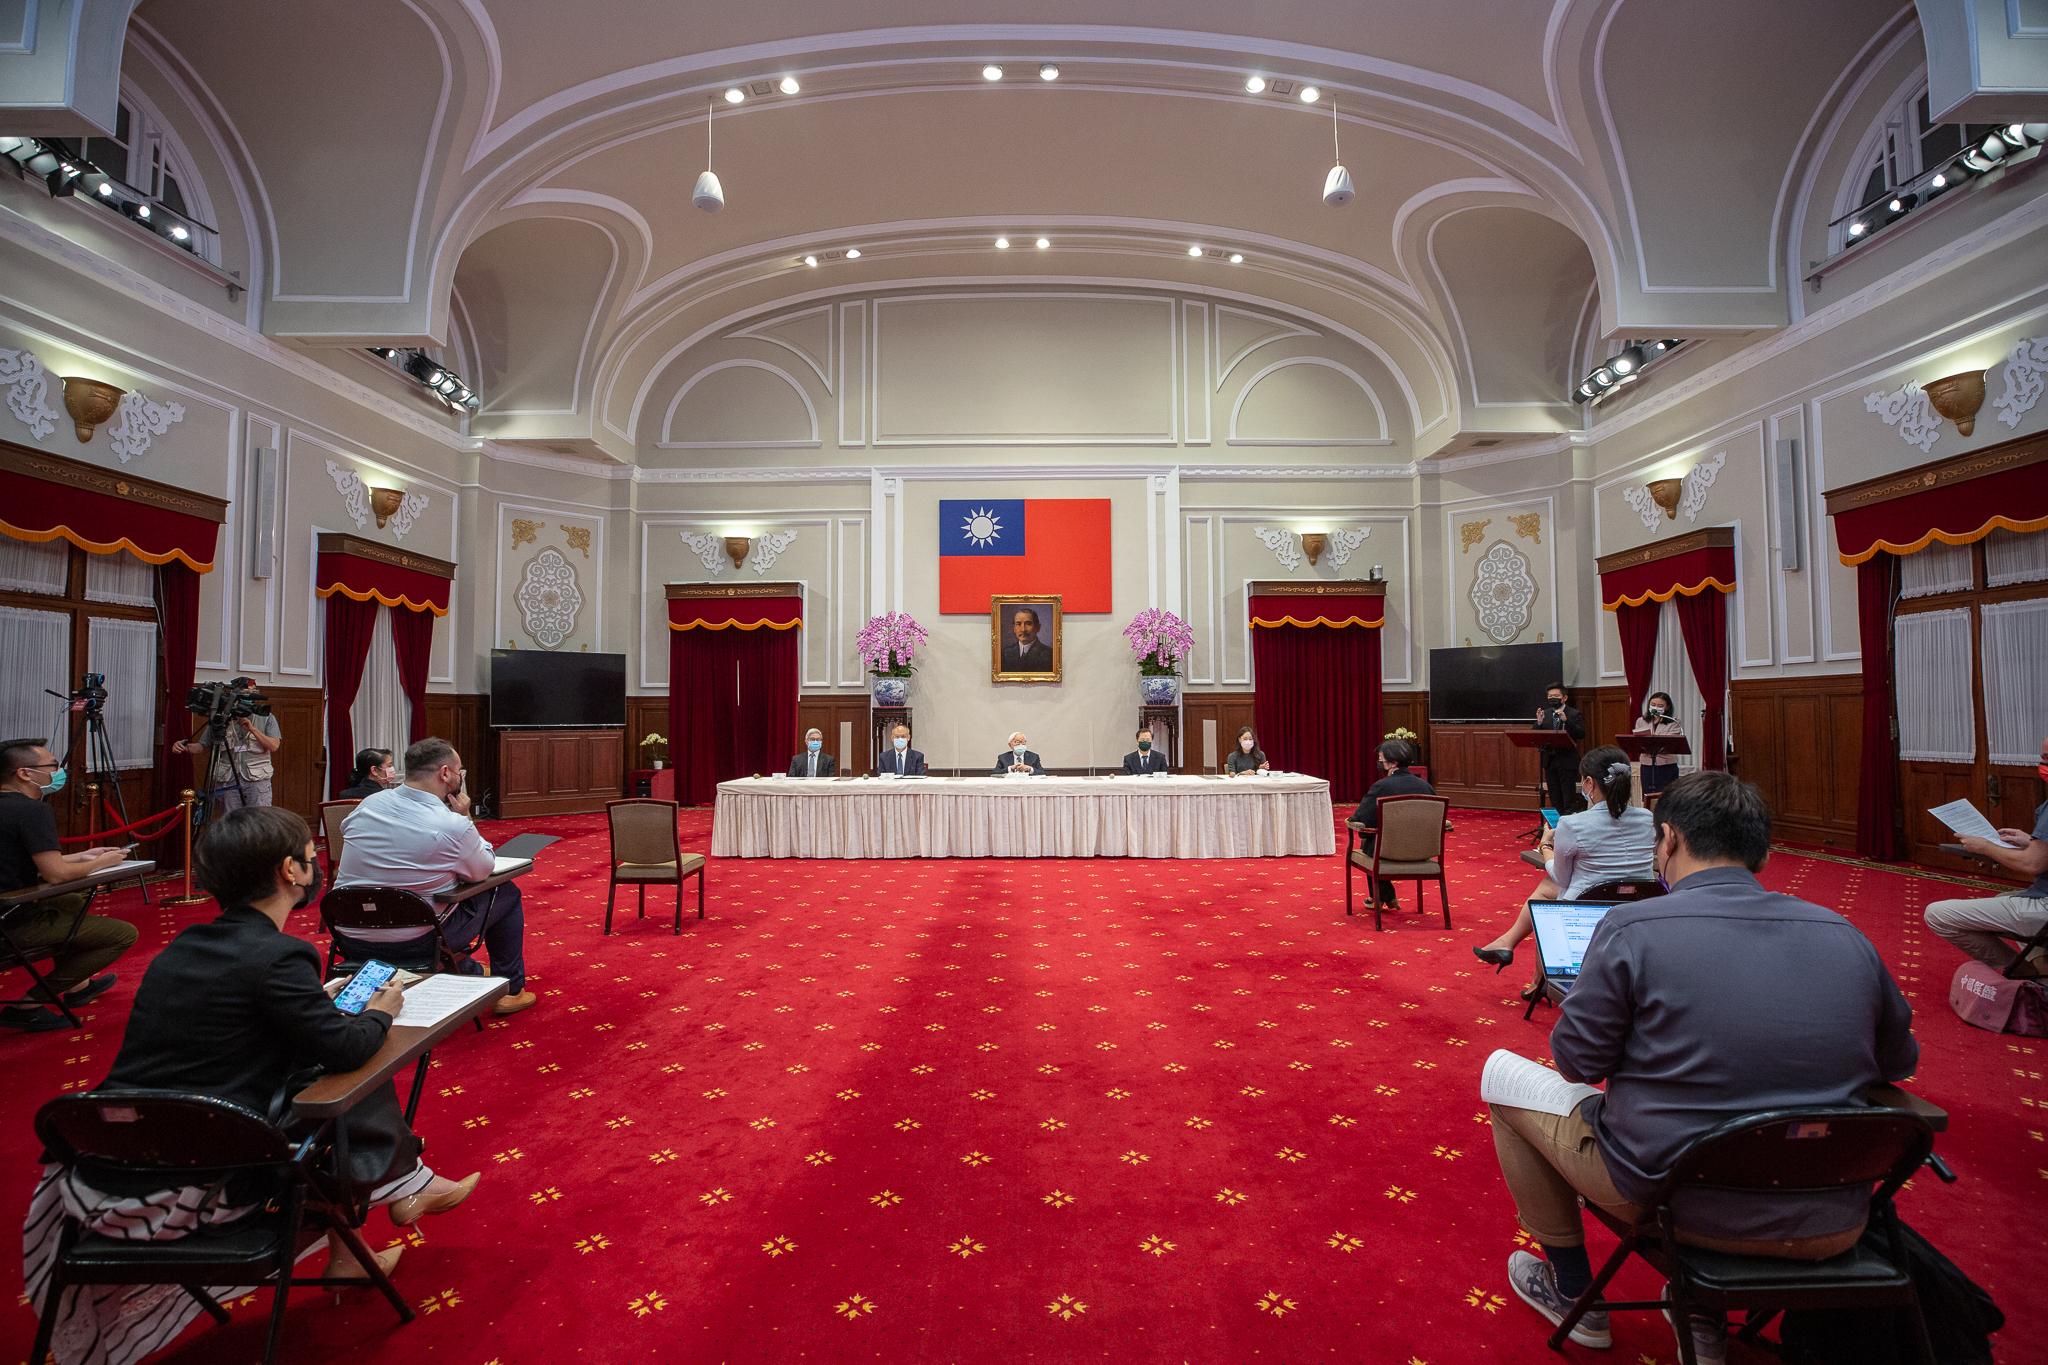 07.16 2021年APEC「非正式領袖閉門會議」會後記者會 Official Photo by Wang Yu Ching / Office of the President